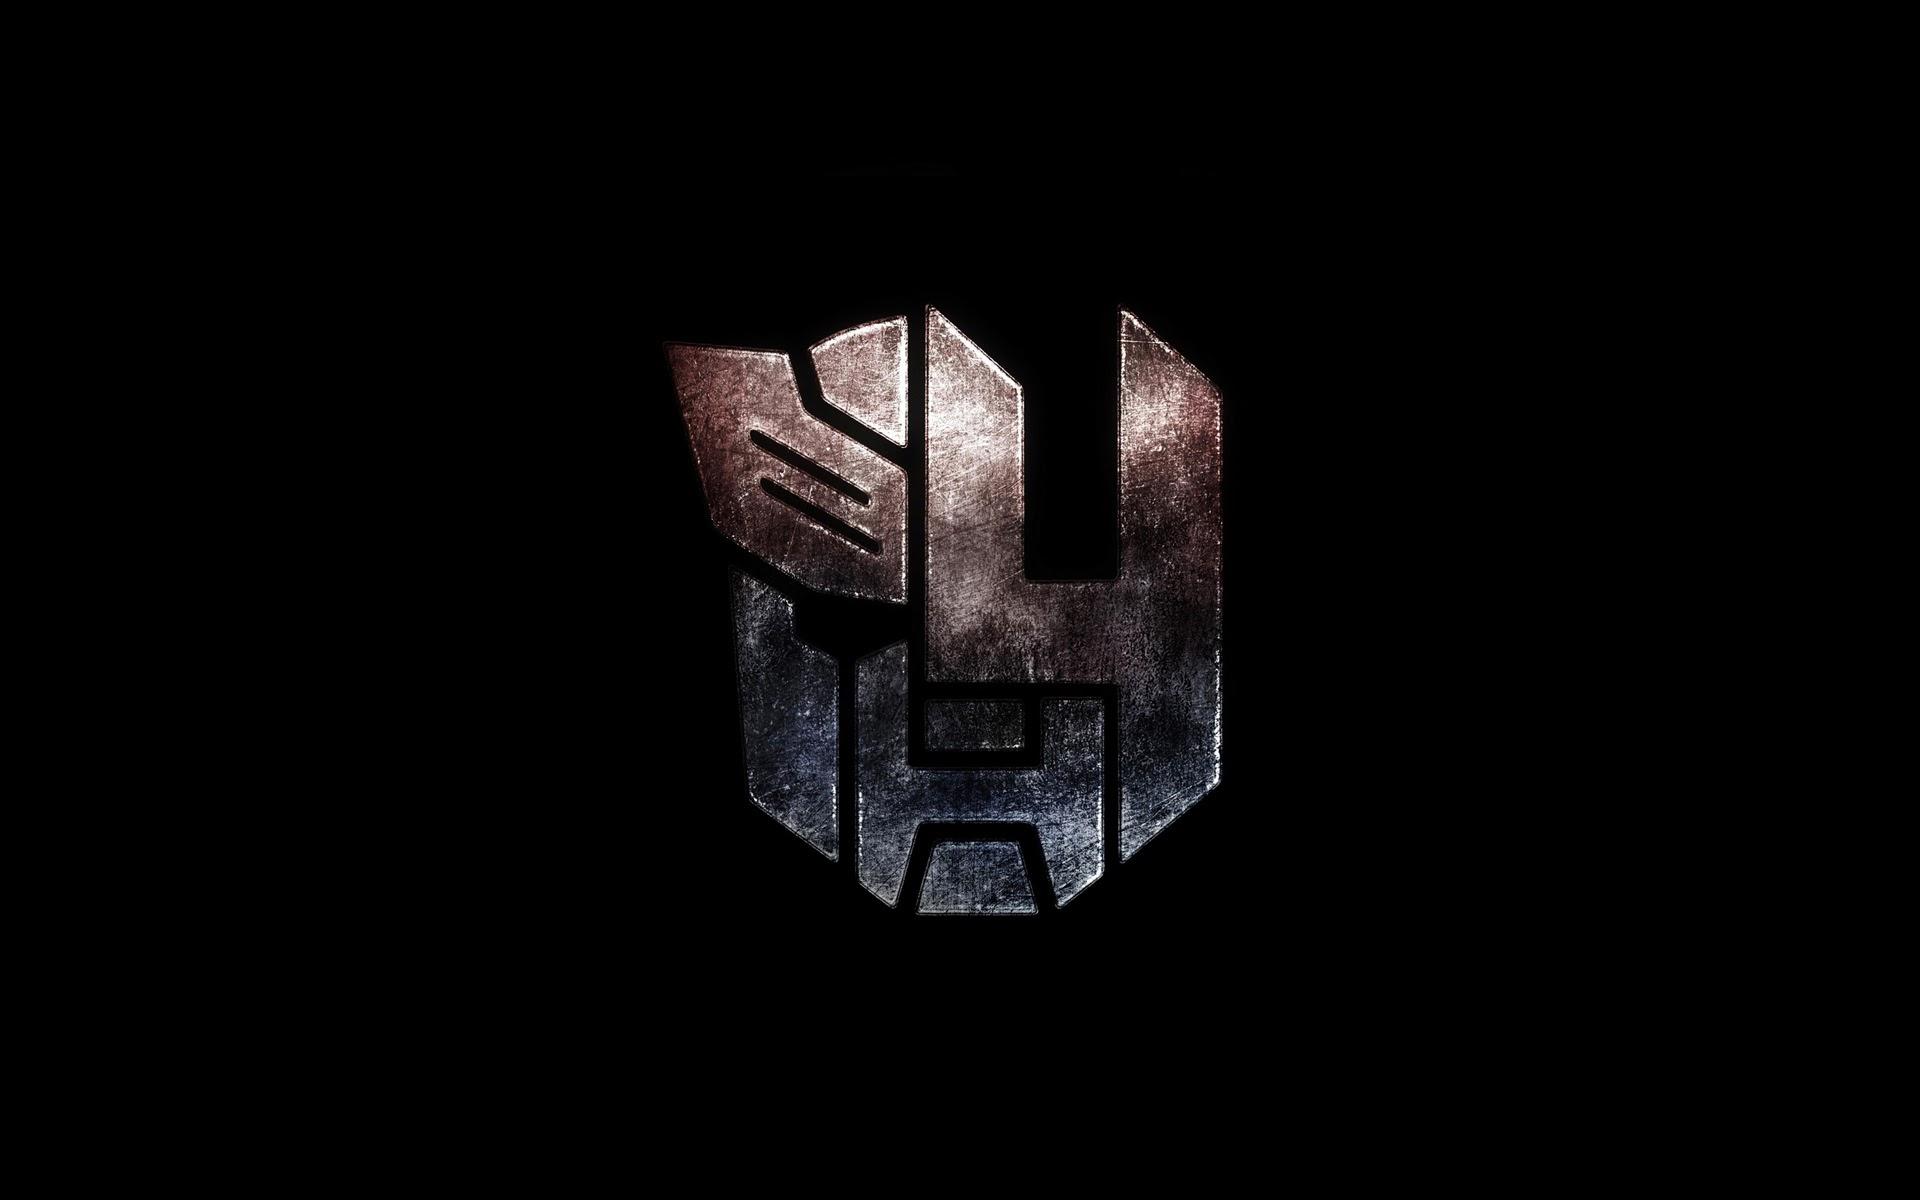 transformer 4 movie 2014 age of extinction autobot logo hd wallpaper 1920x1200